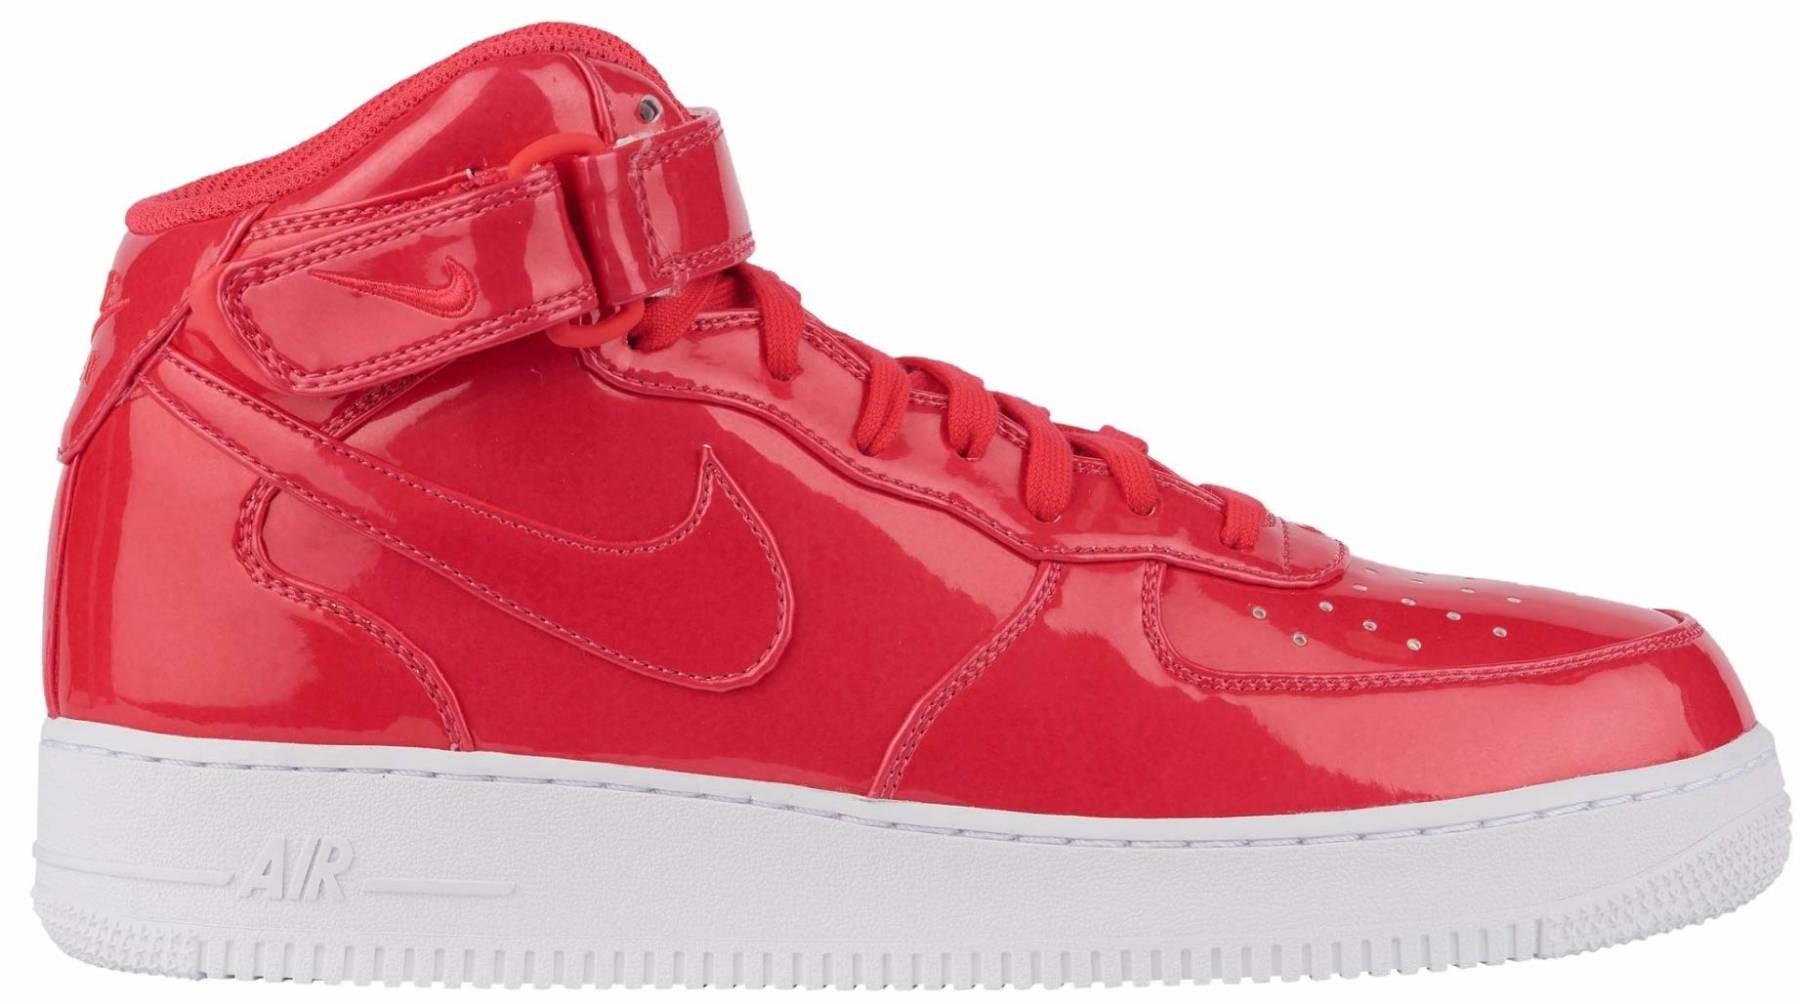 Nike Air Force 1 Mid 07 LV8 UV sneakers in red | RunRepeat